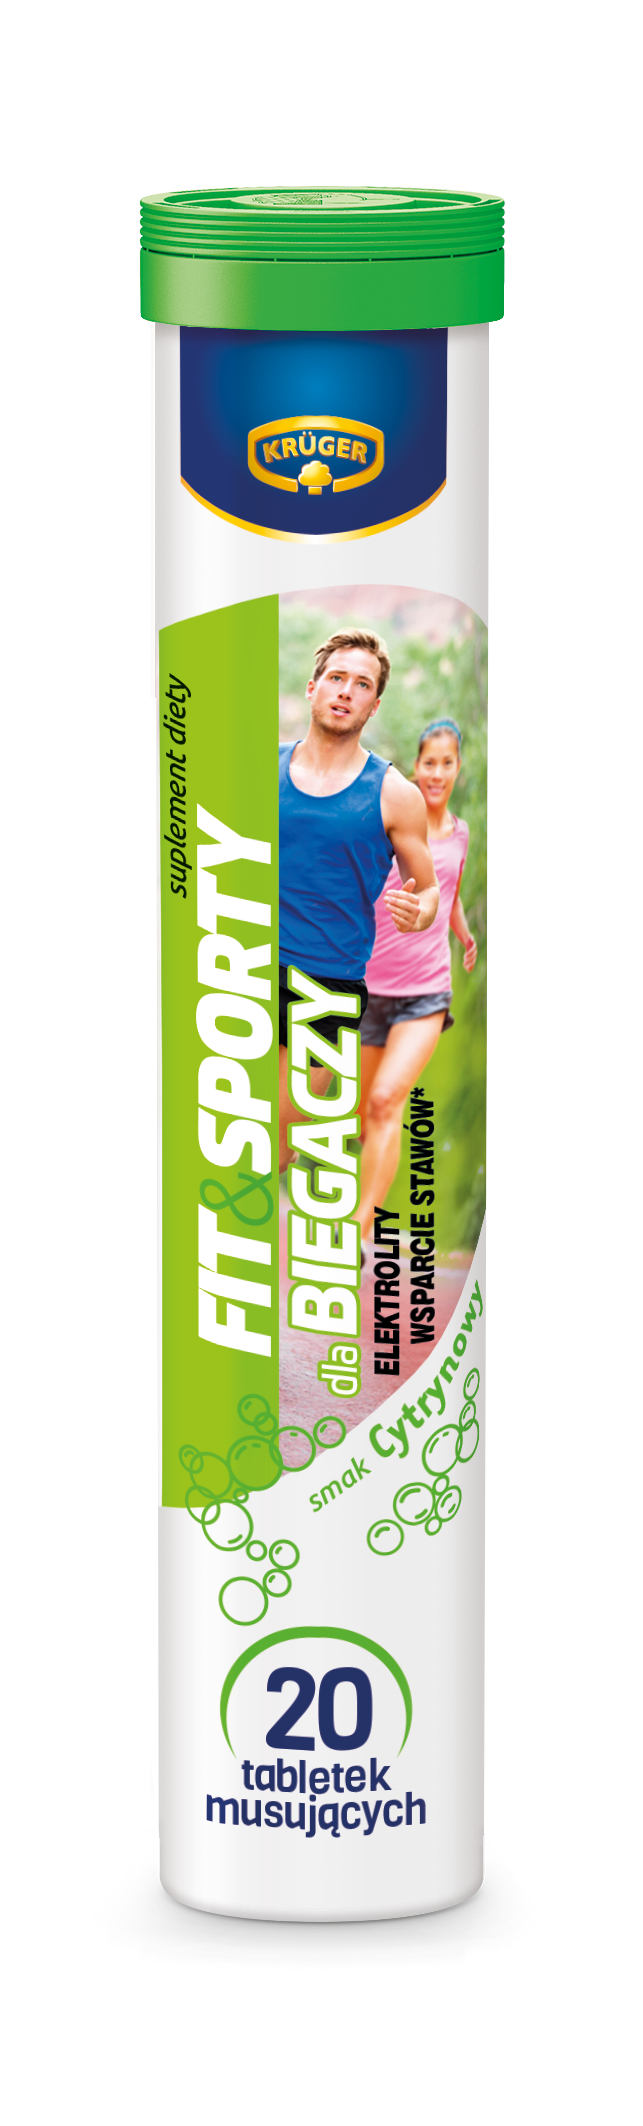 Krüger Fit&Sporty